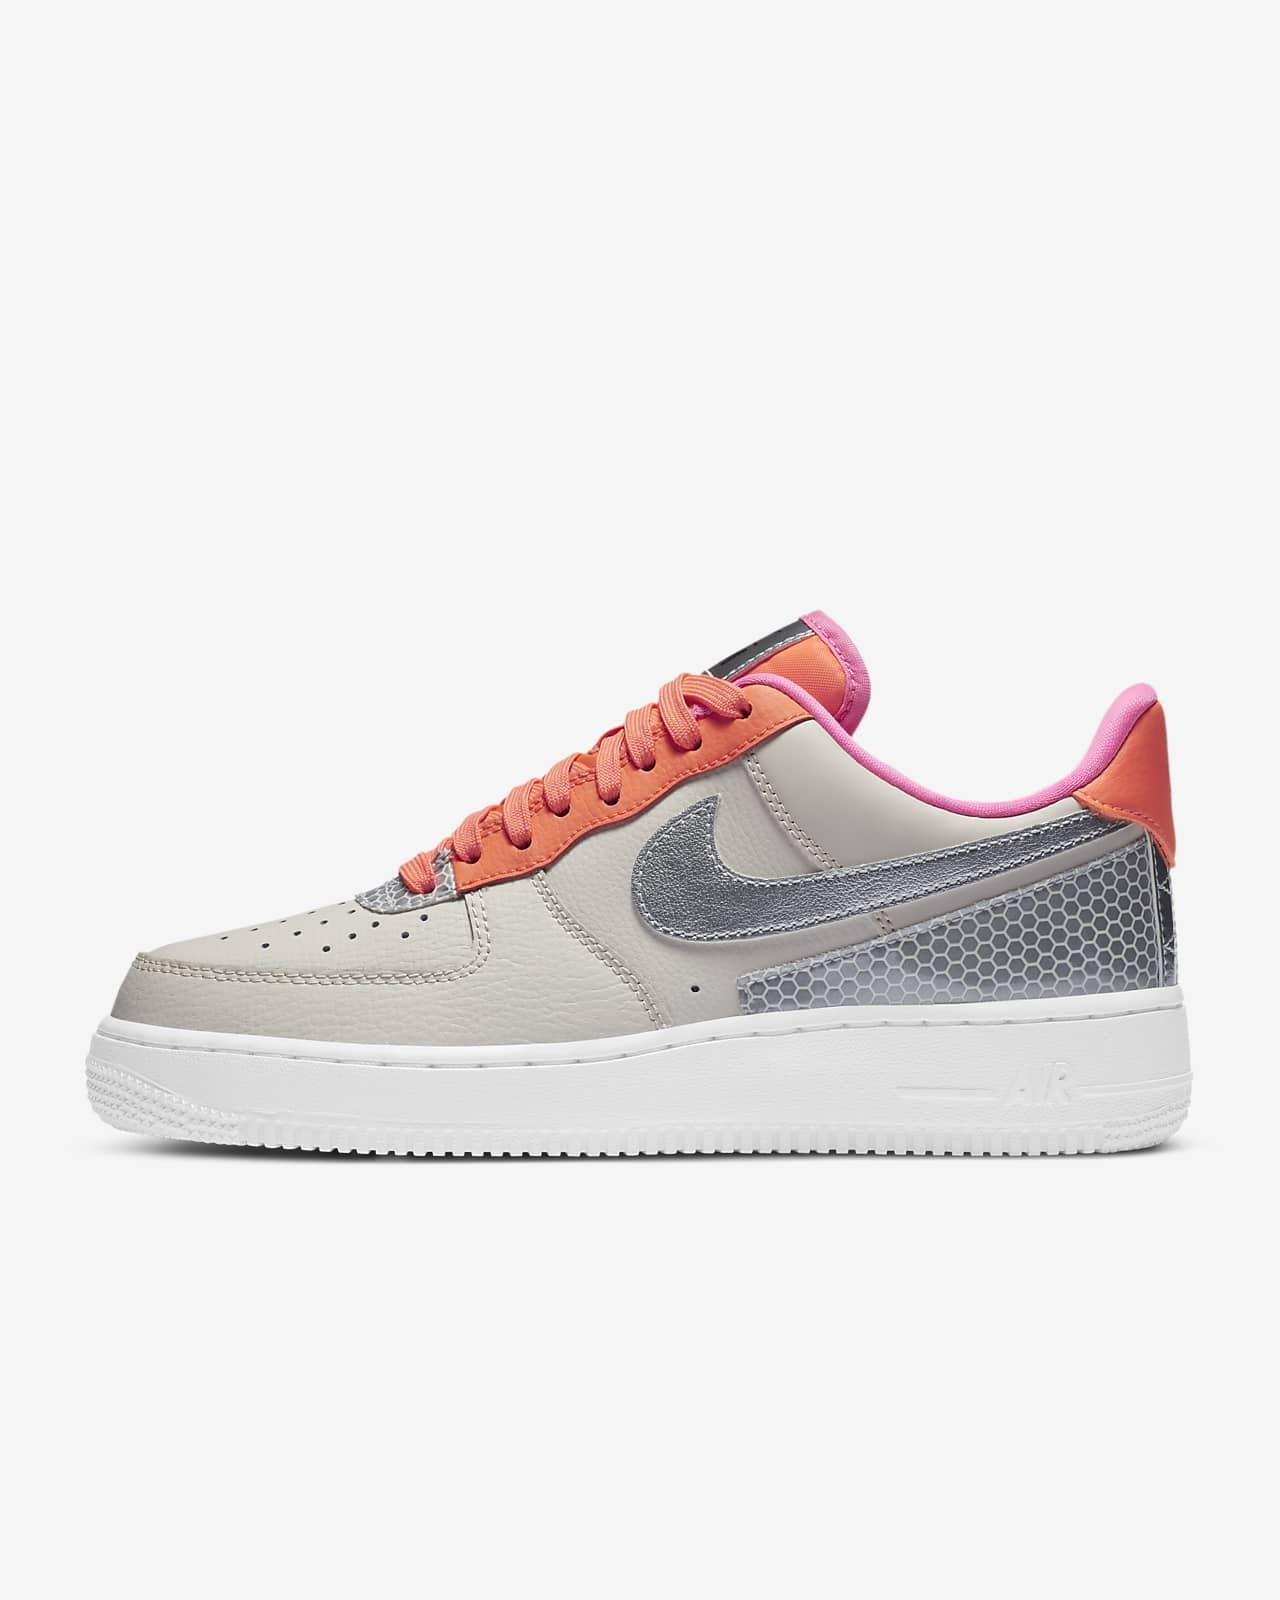 Nike Air Force 1 '07 SE 女子运动鞋